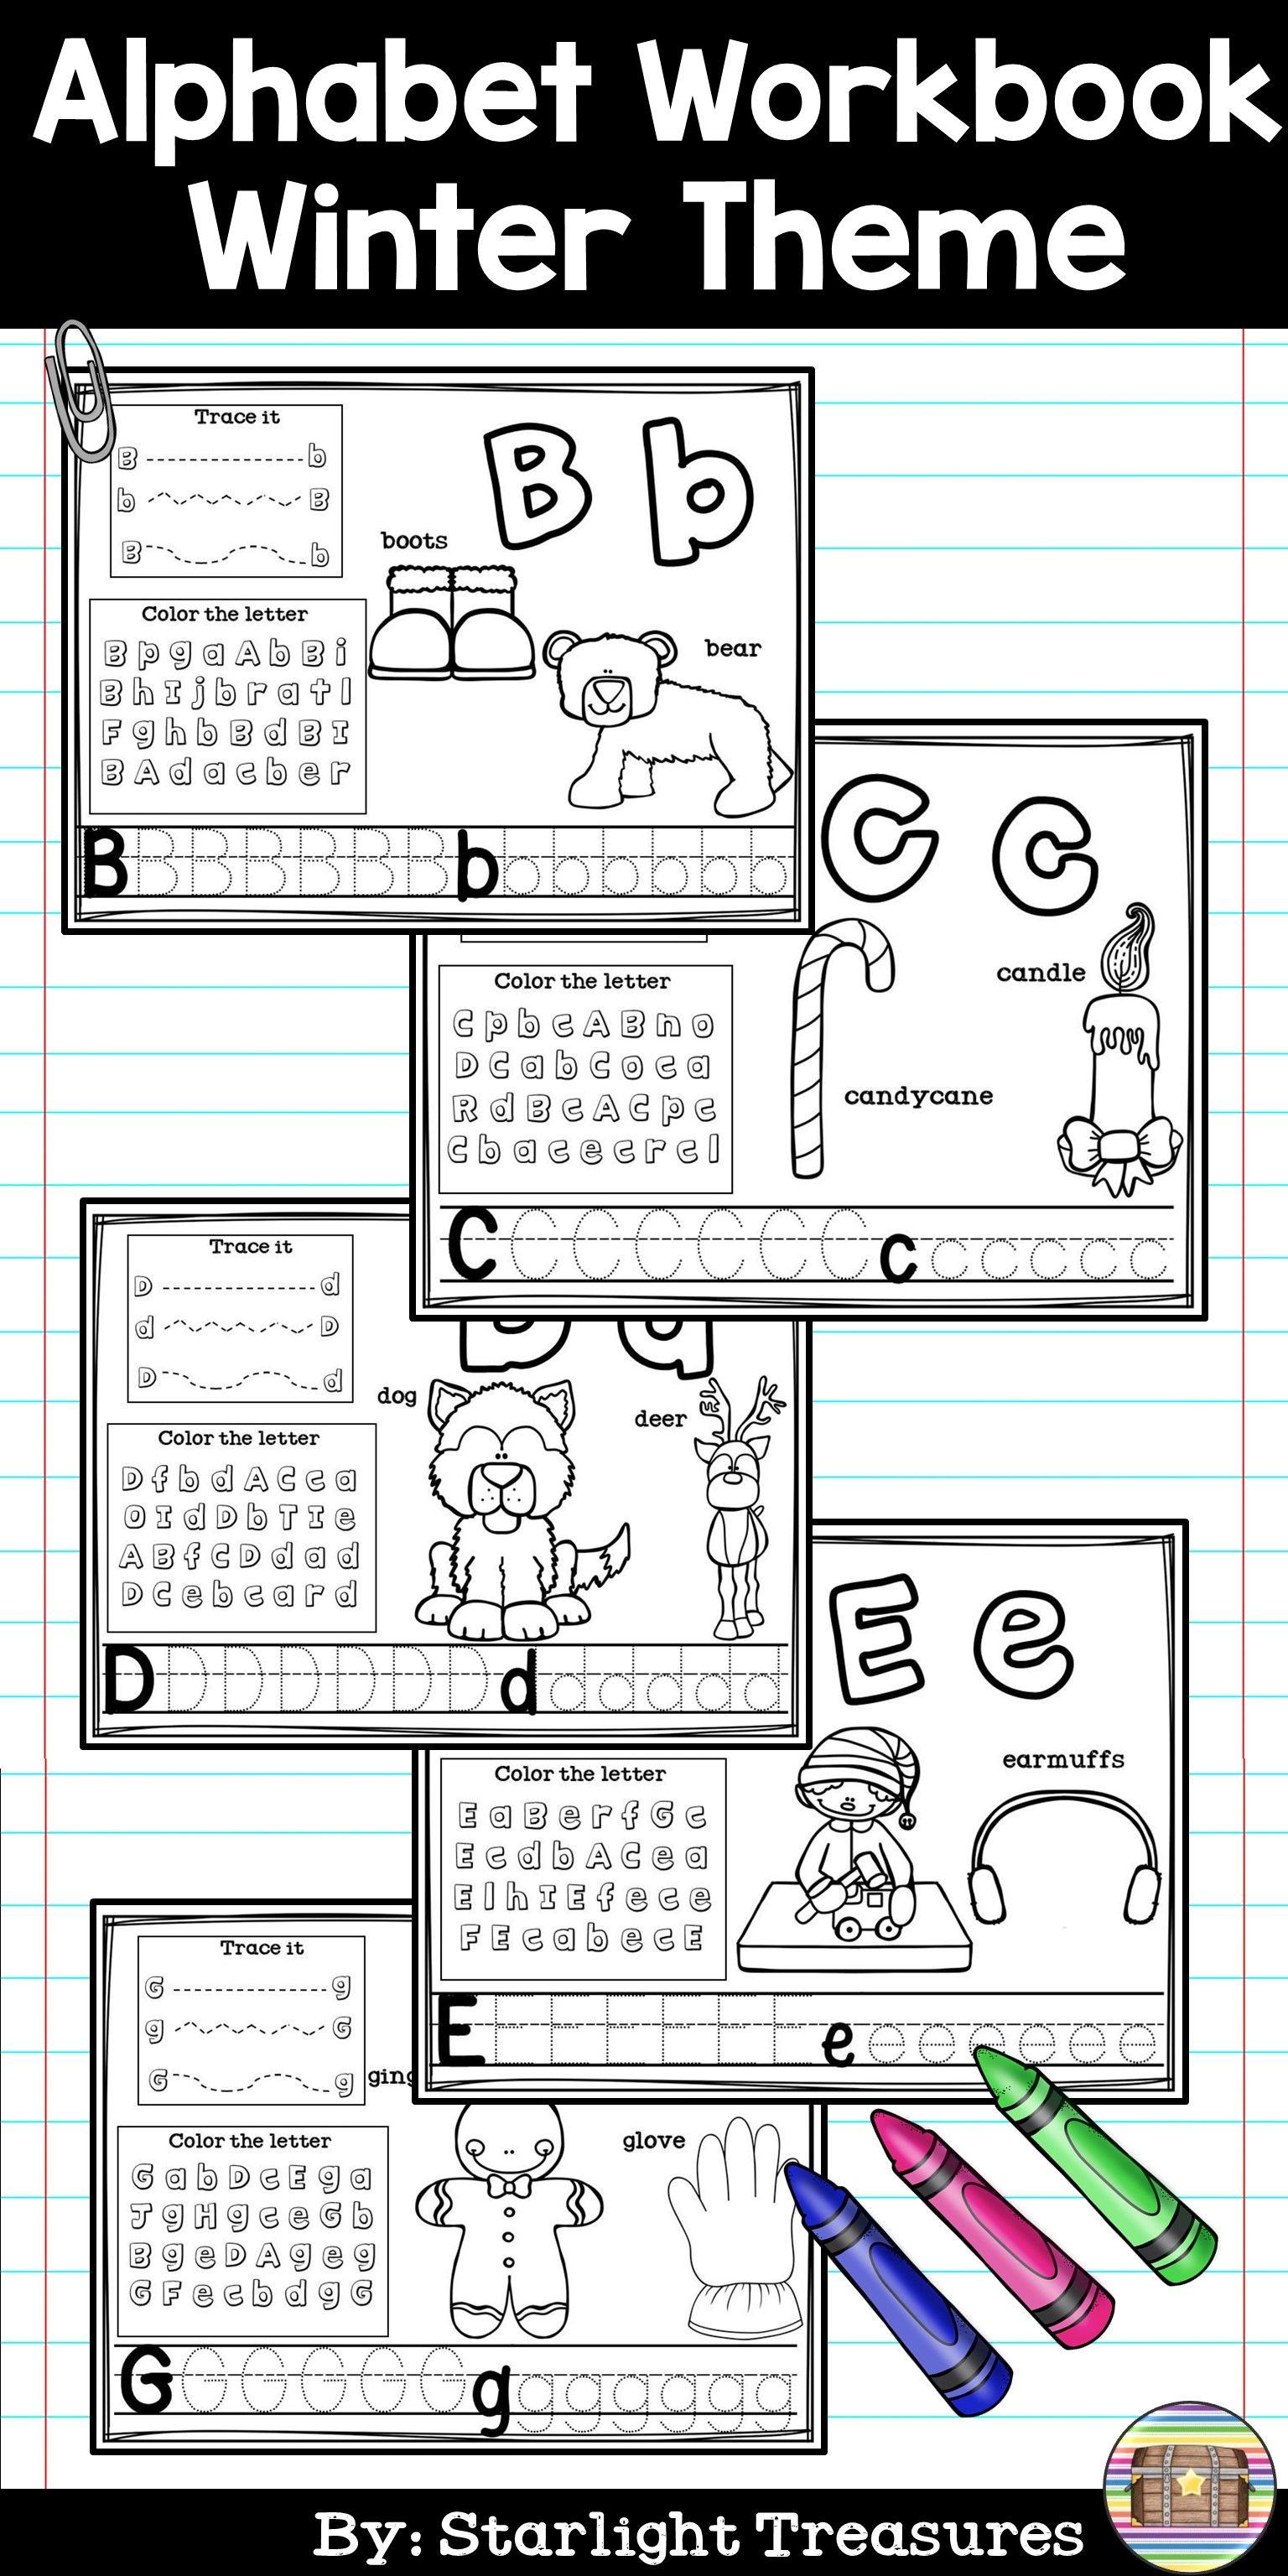 Alphabet Workbook Worksheets A Z Winter Theme